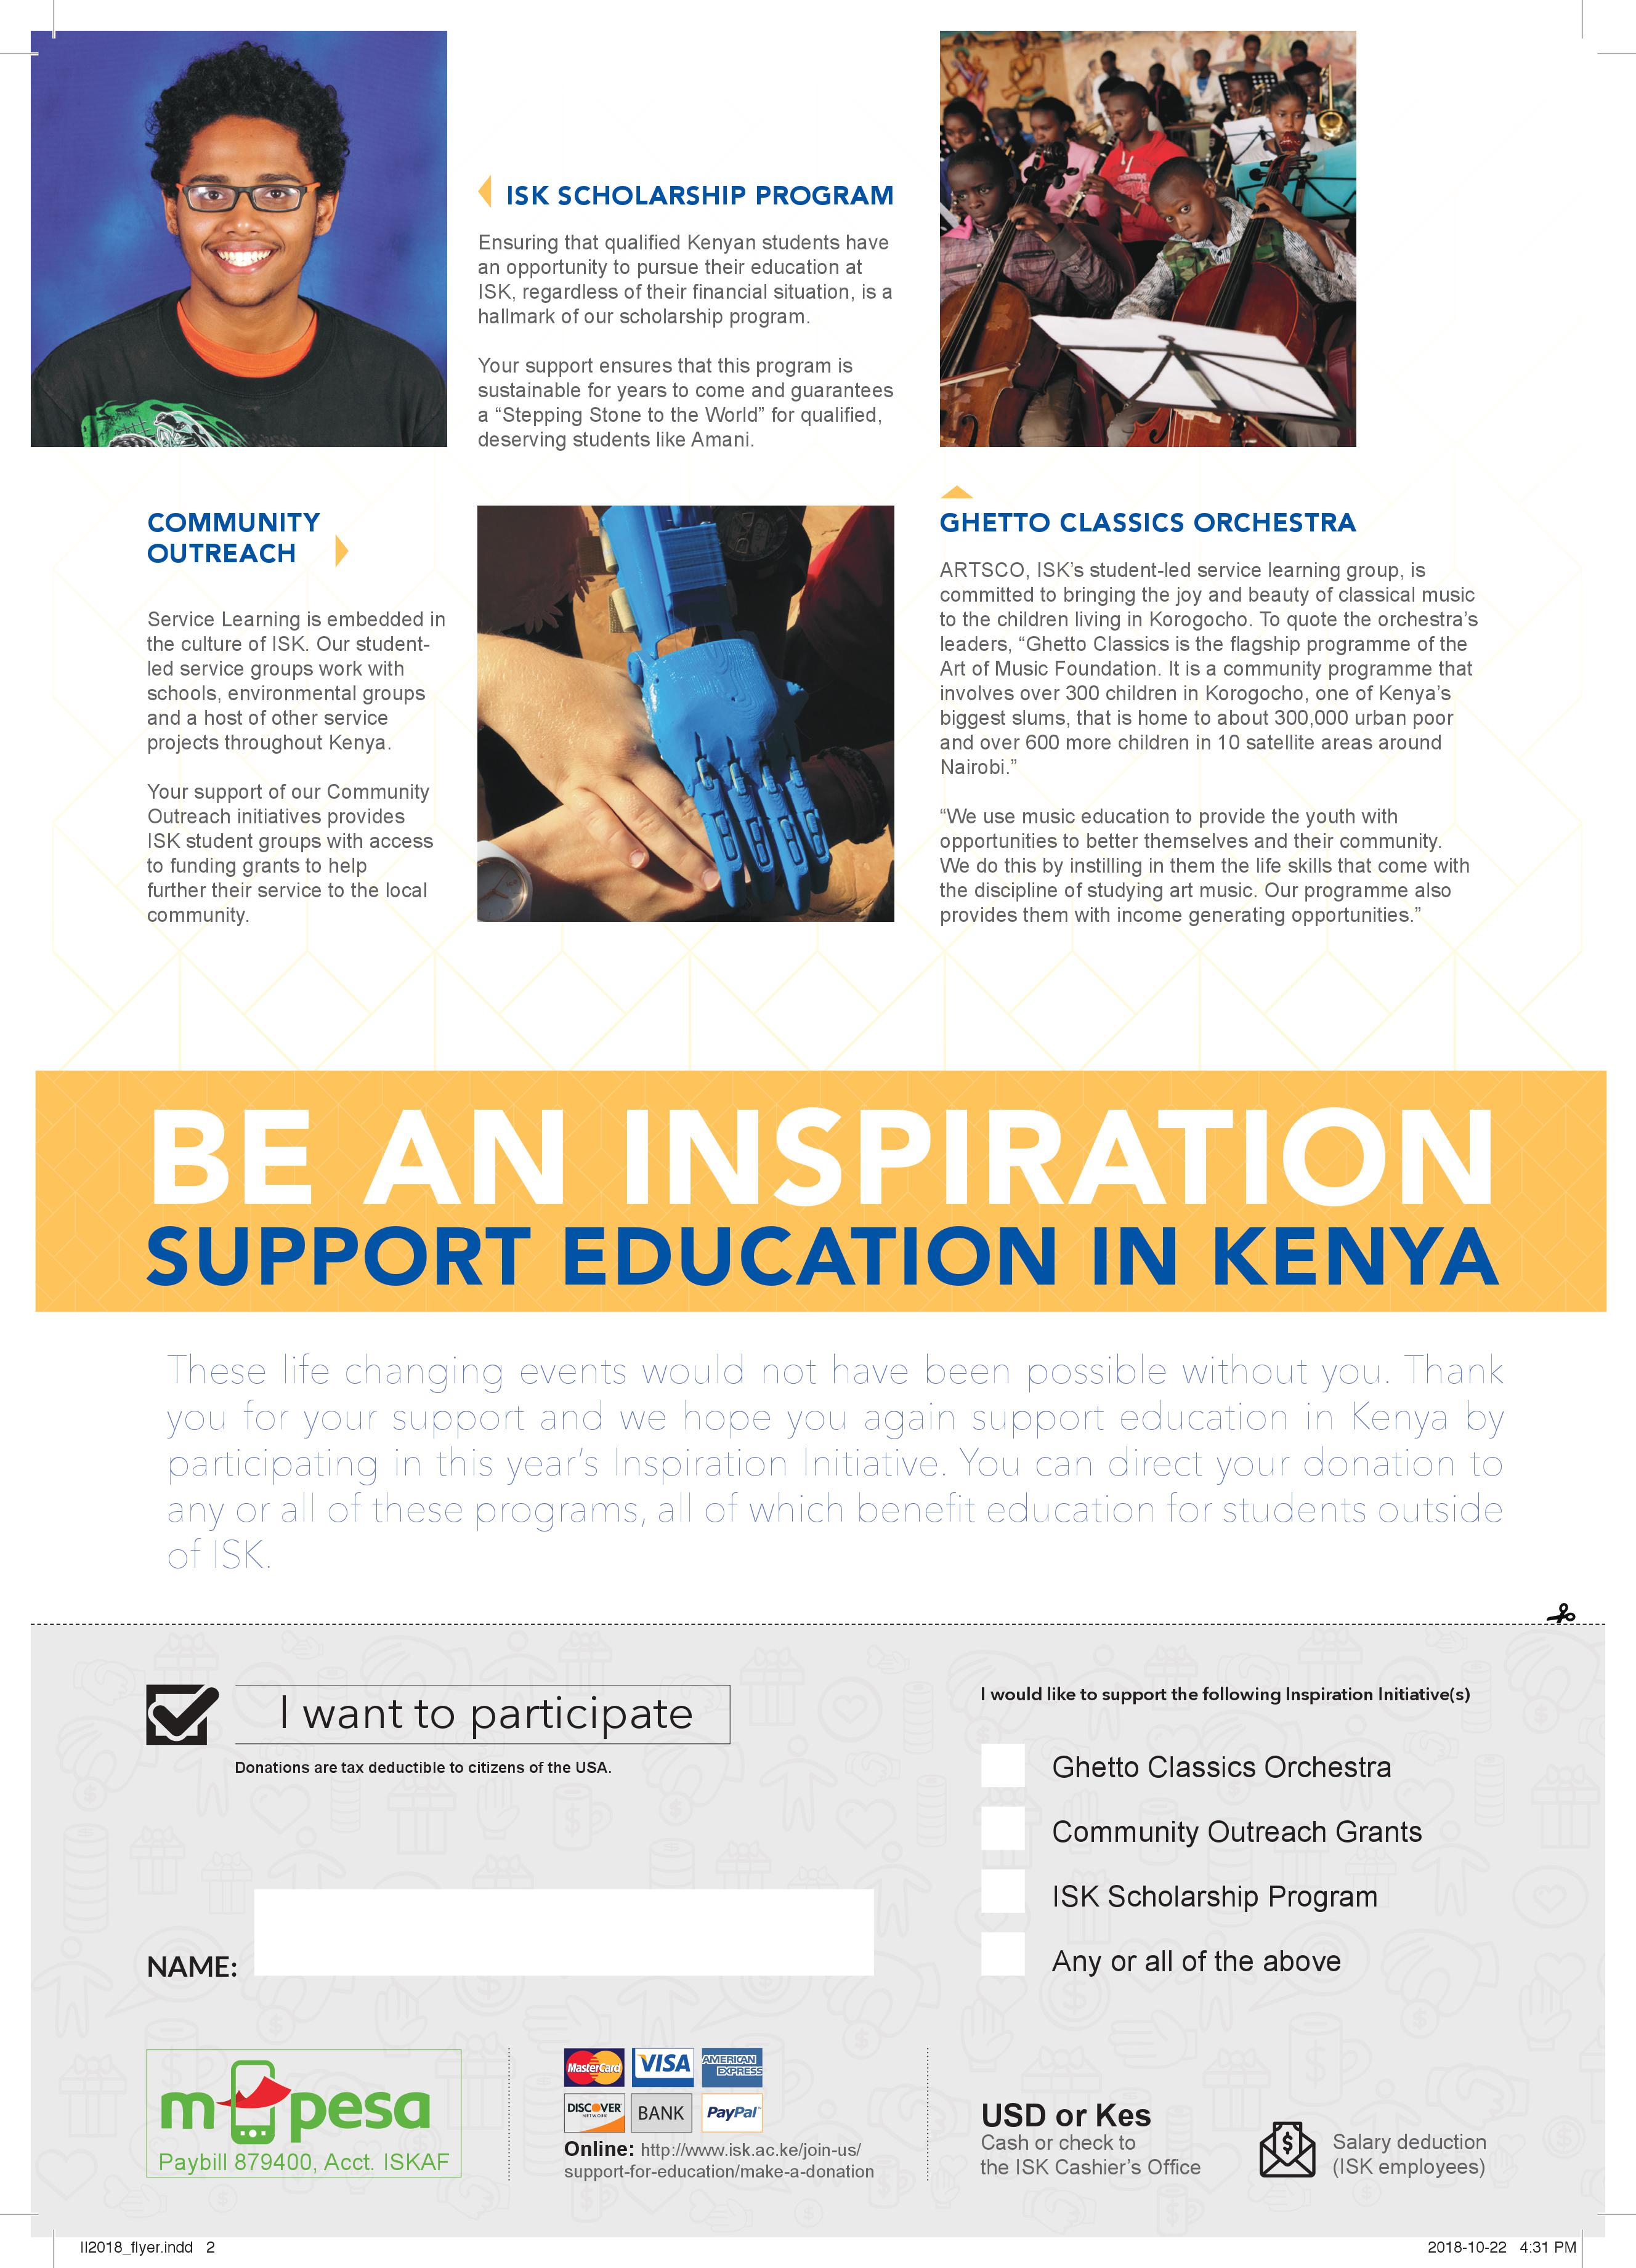 Support for Education - International School of Kenya